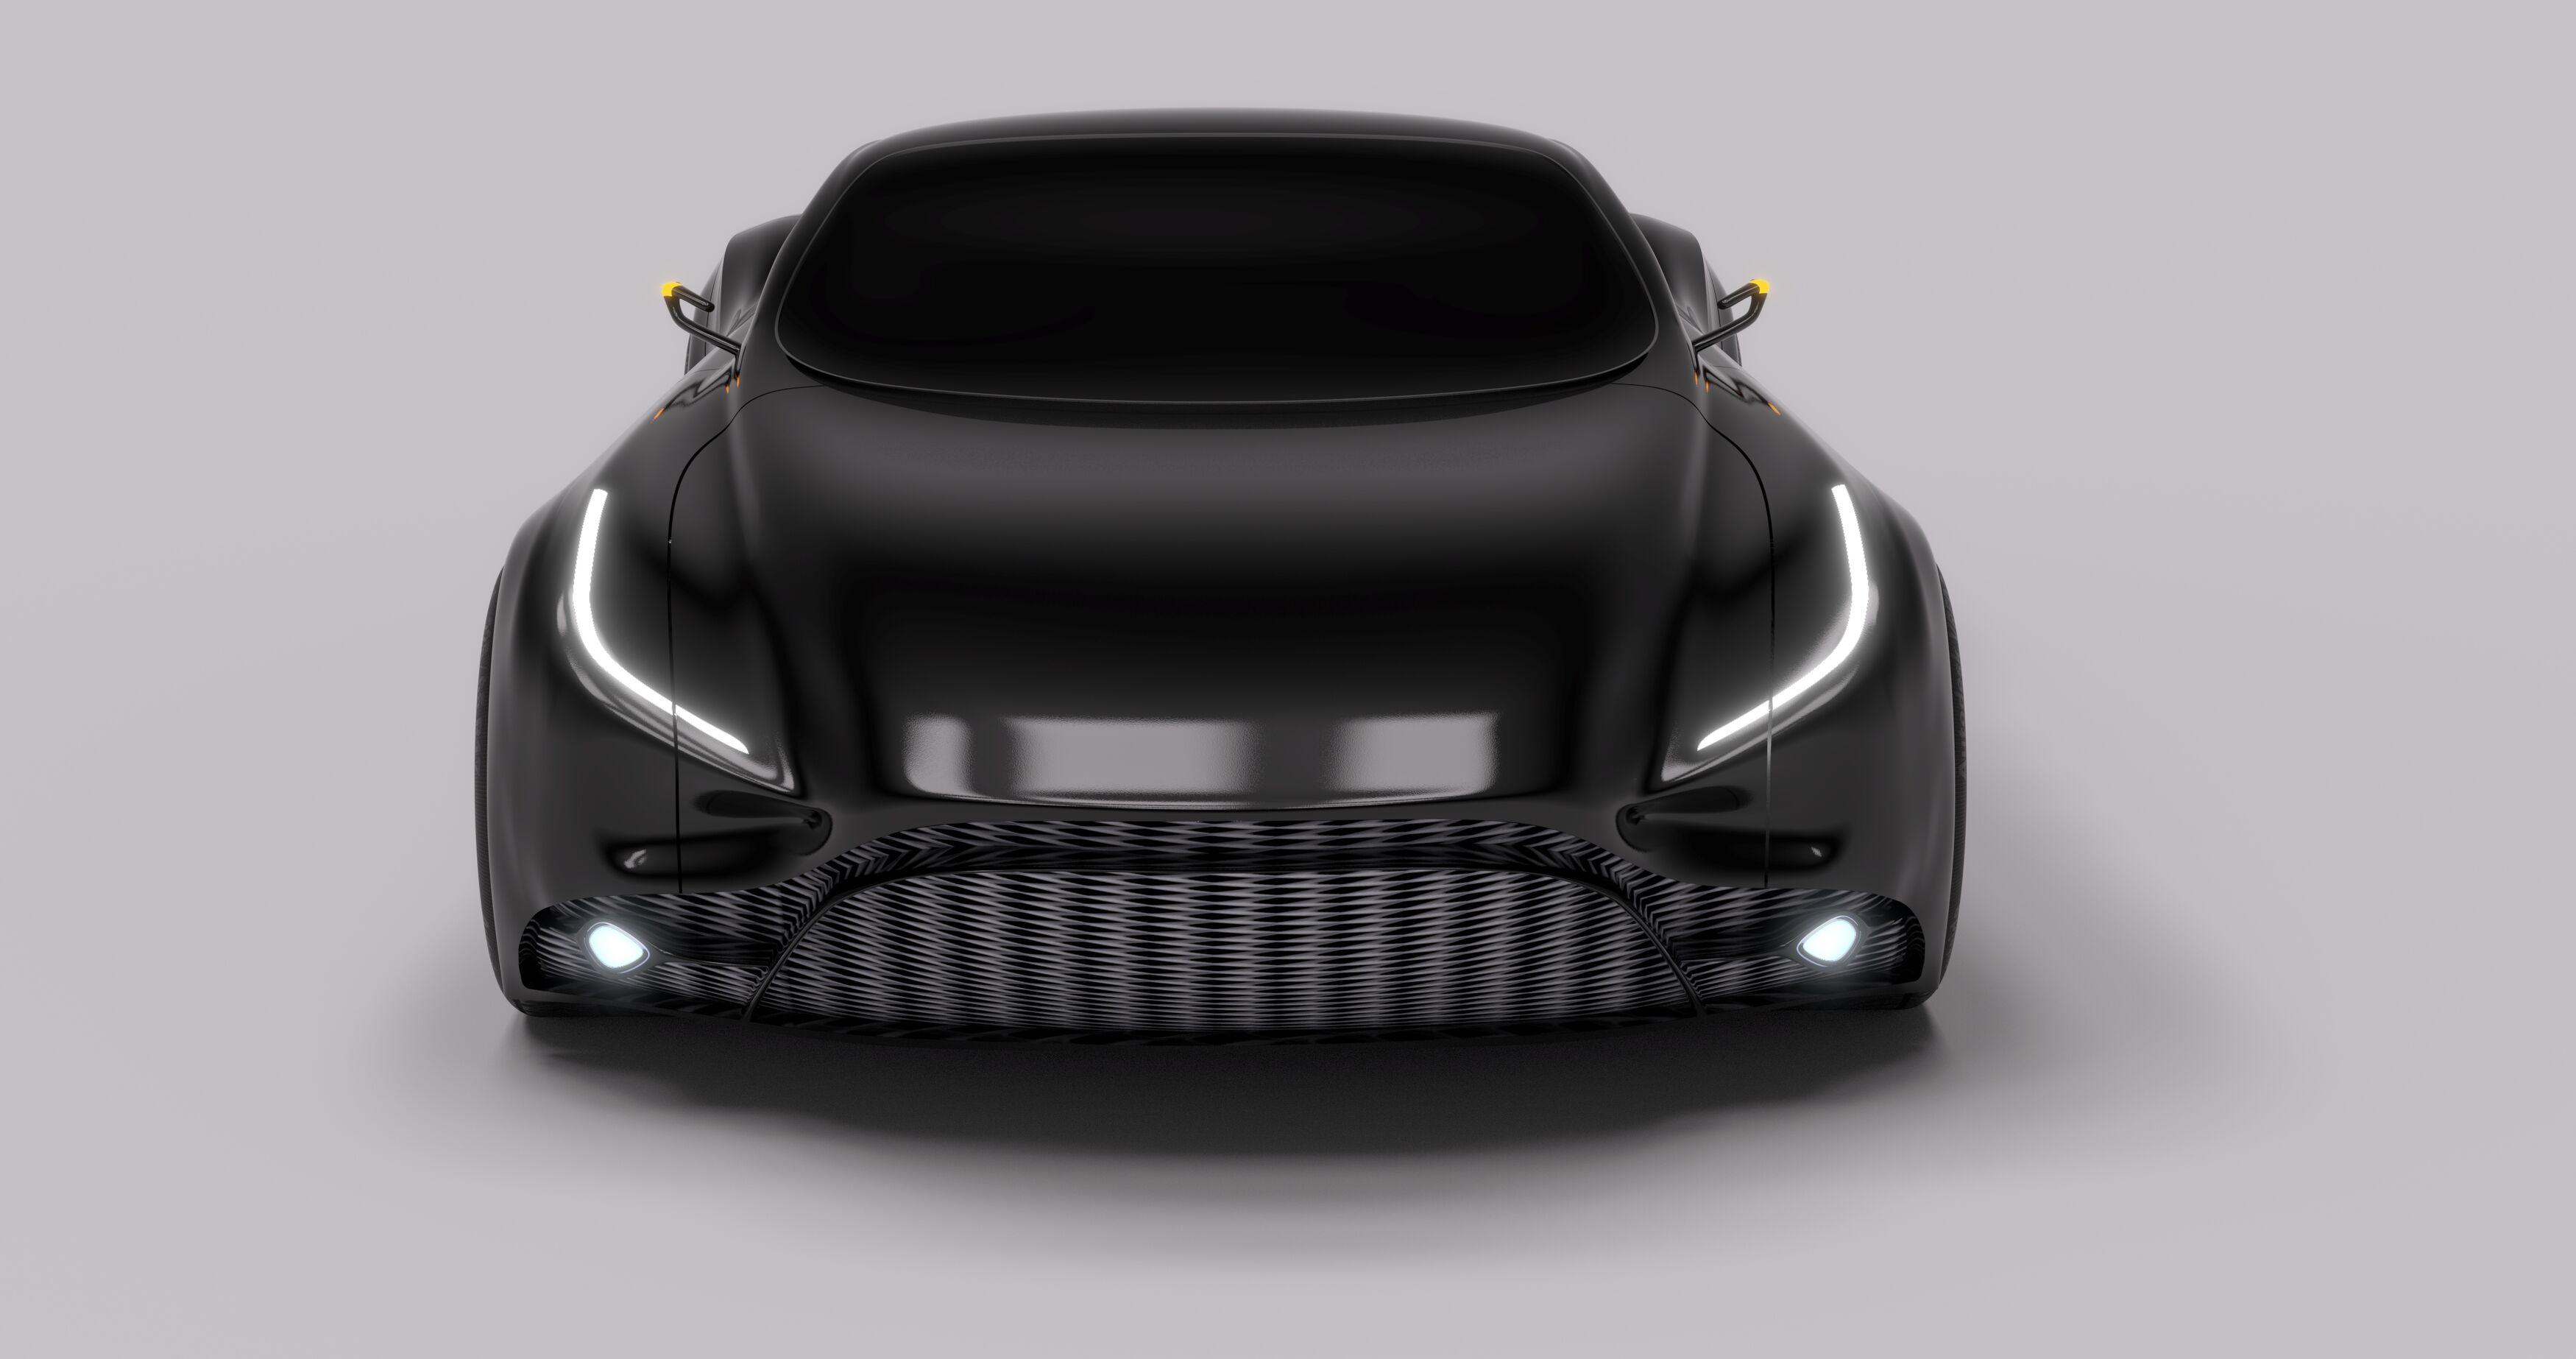 Aston-martin-db-zagato-x-6-3500-3500